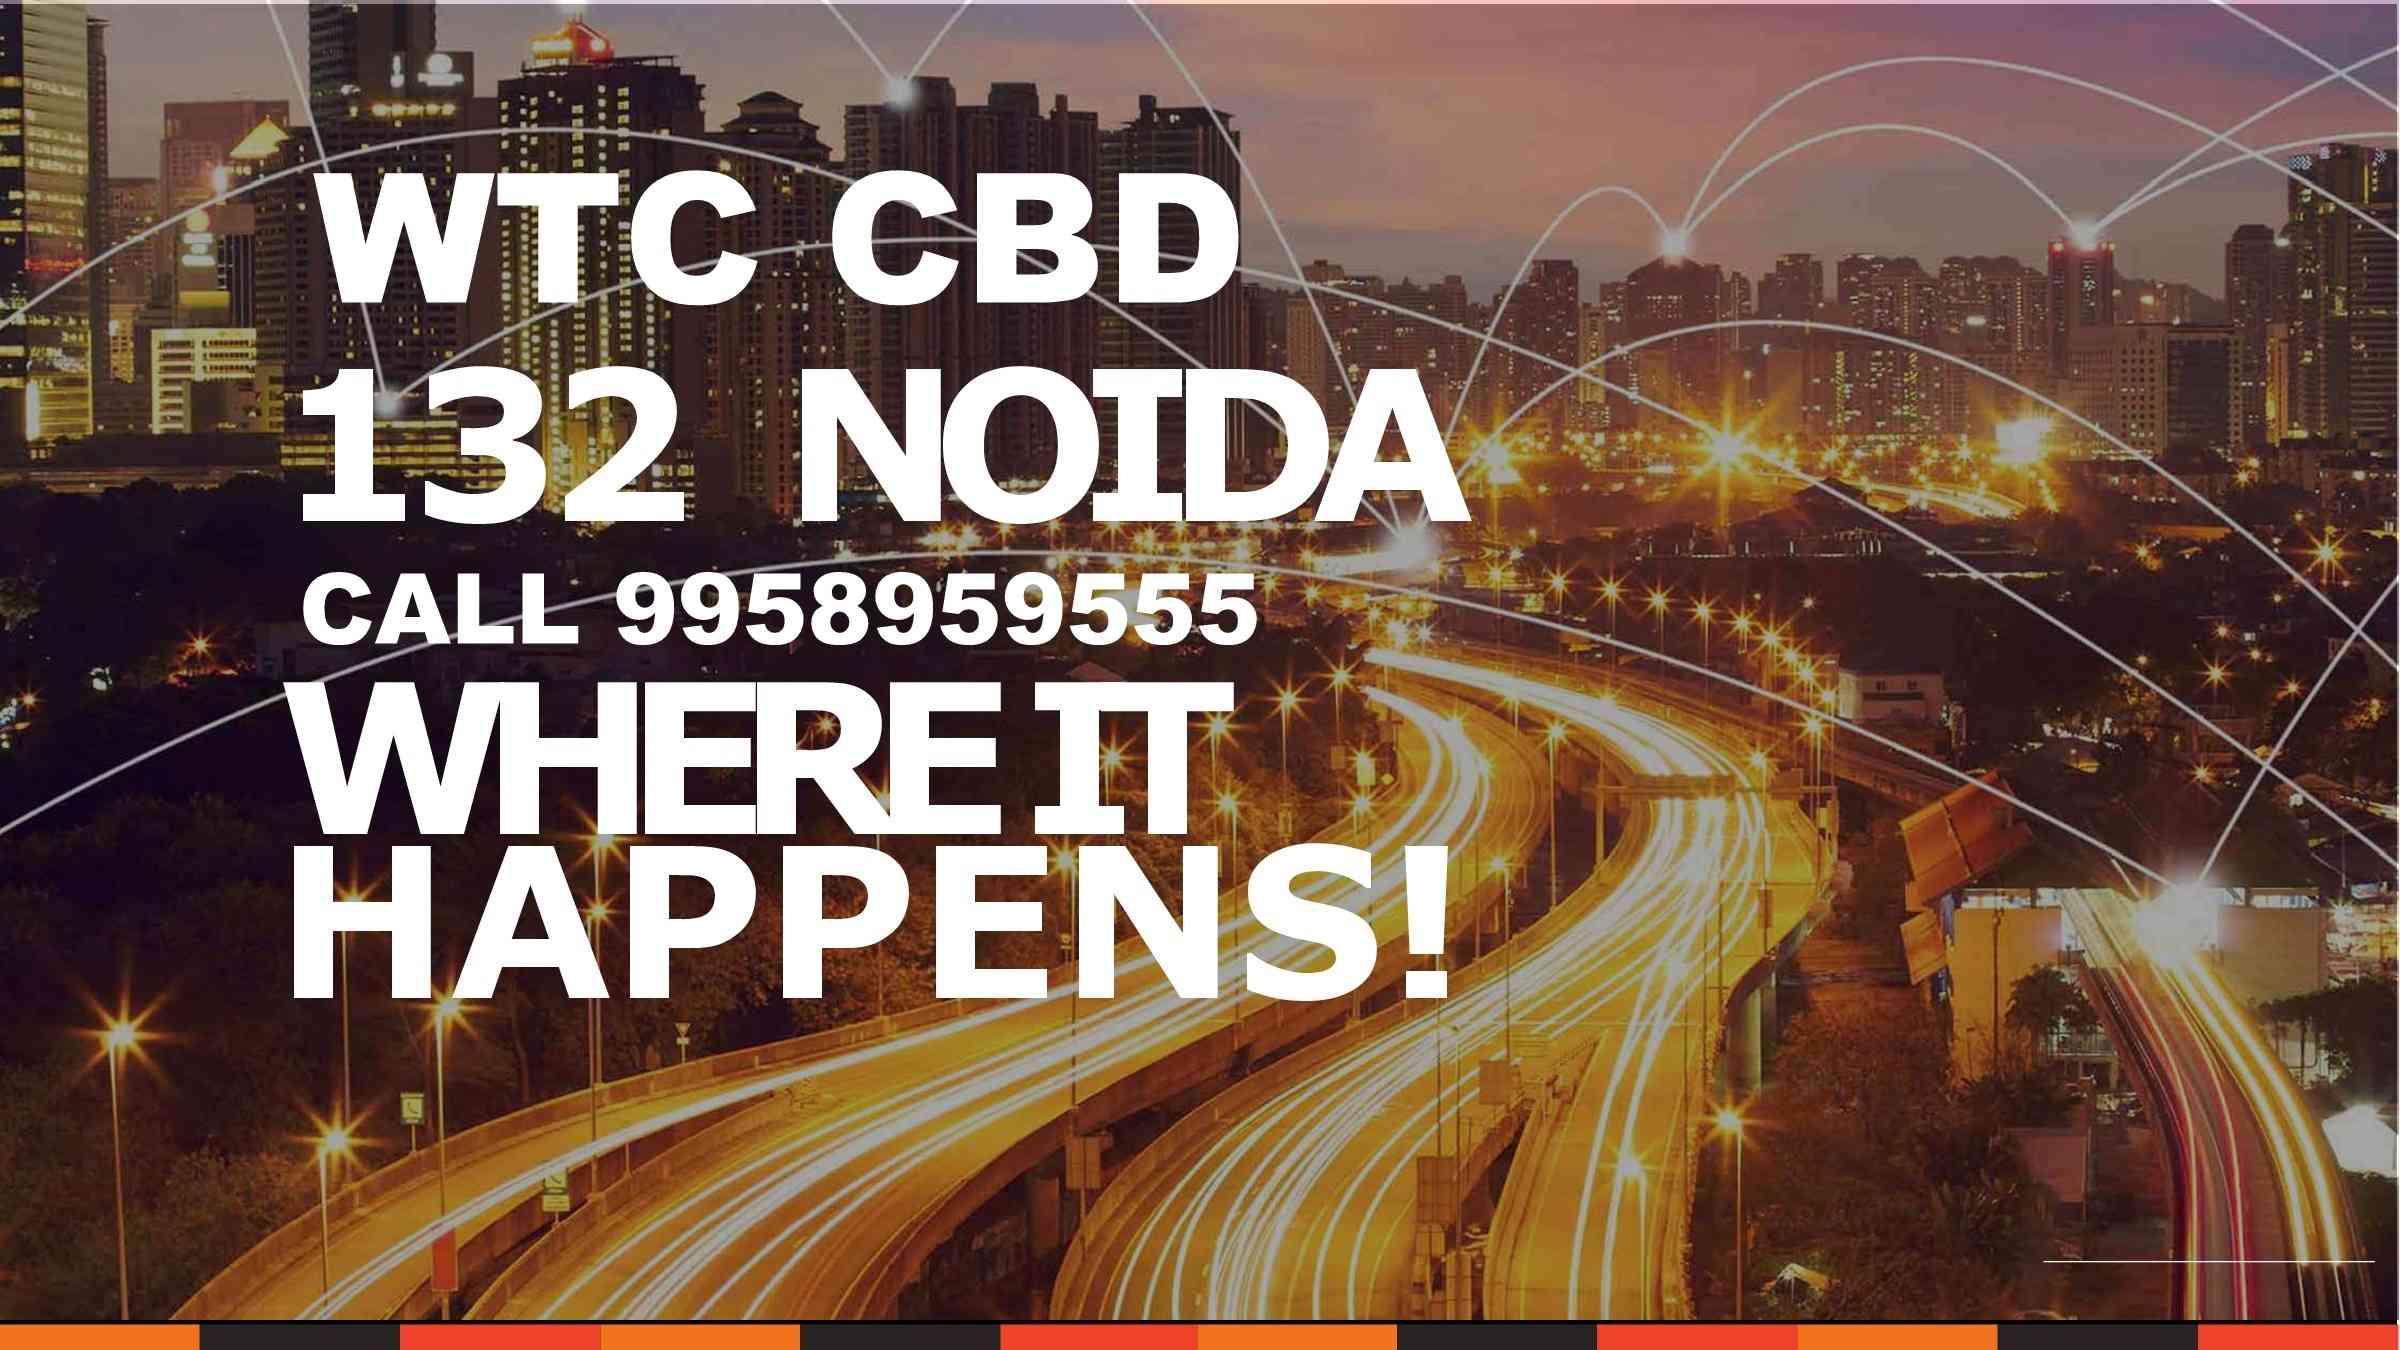 Wtc Noida Retail Spaces, World Trade Center Noida Retail Spaces, Retail Spaces in Greater Noida